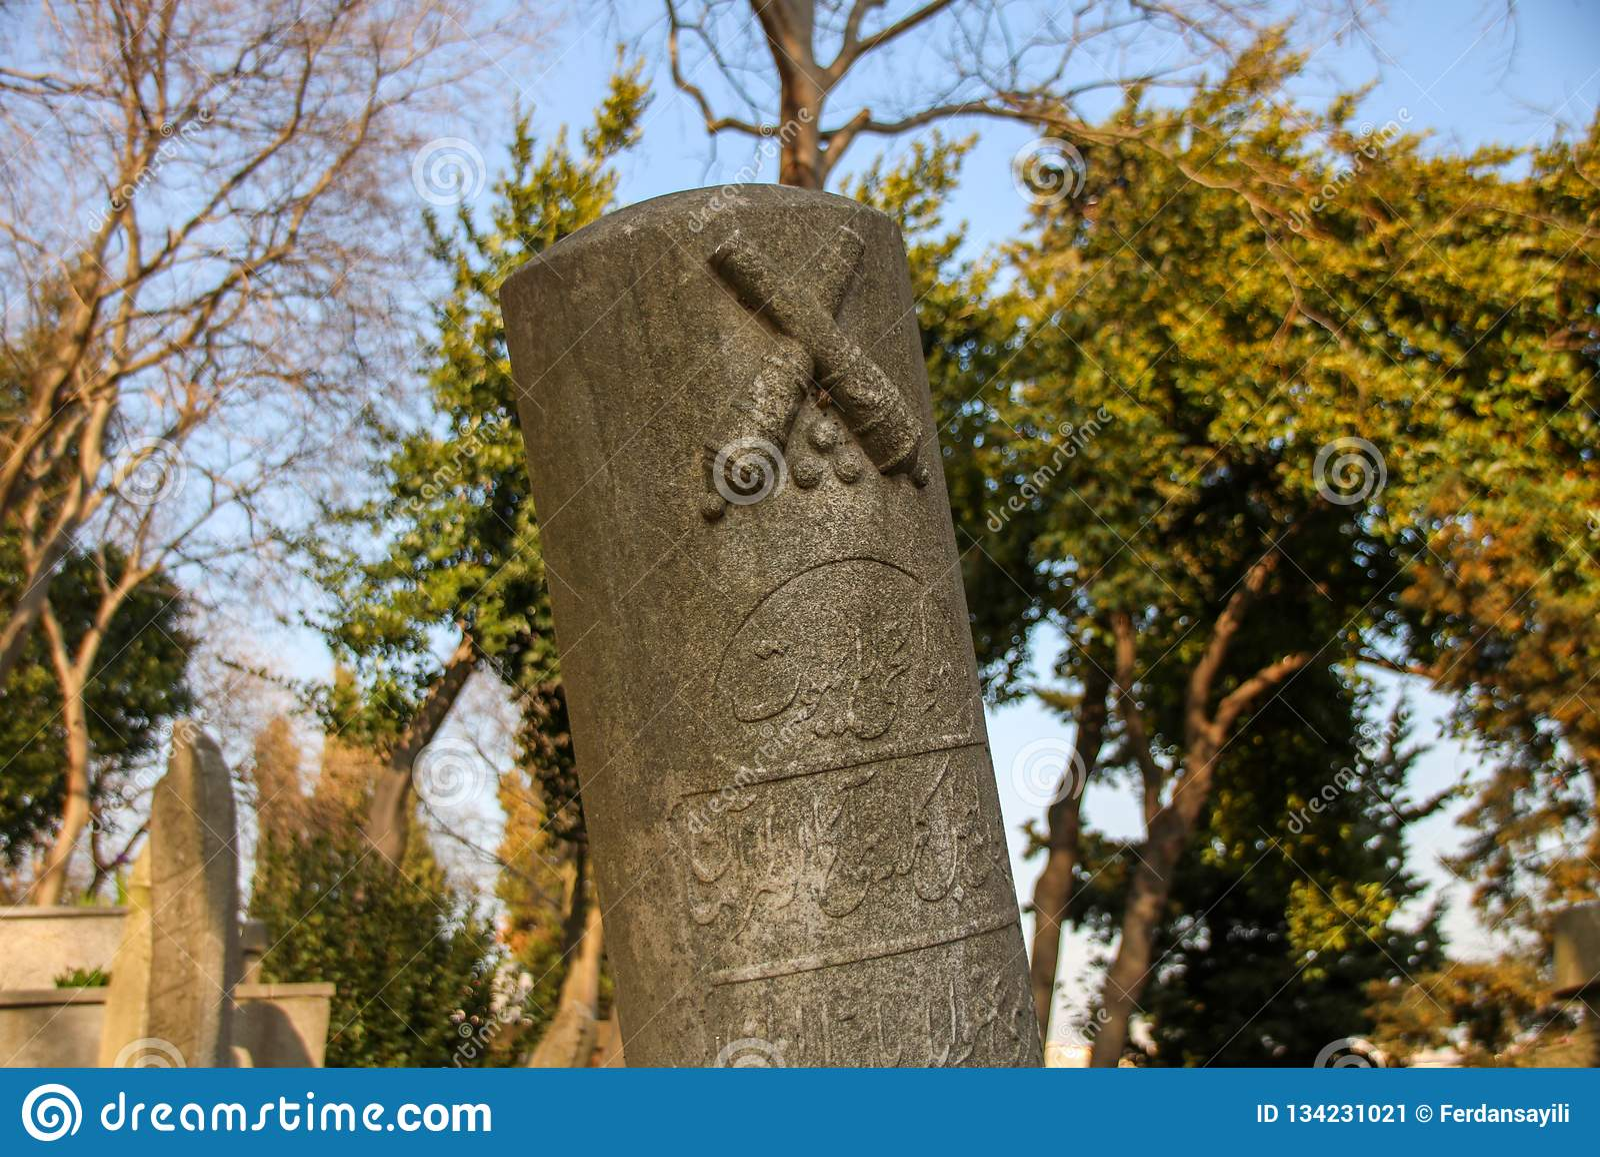 Ancient tomb stone, the Ottoman period, Turkey